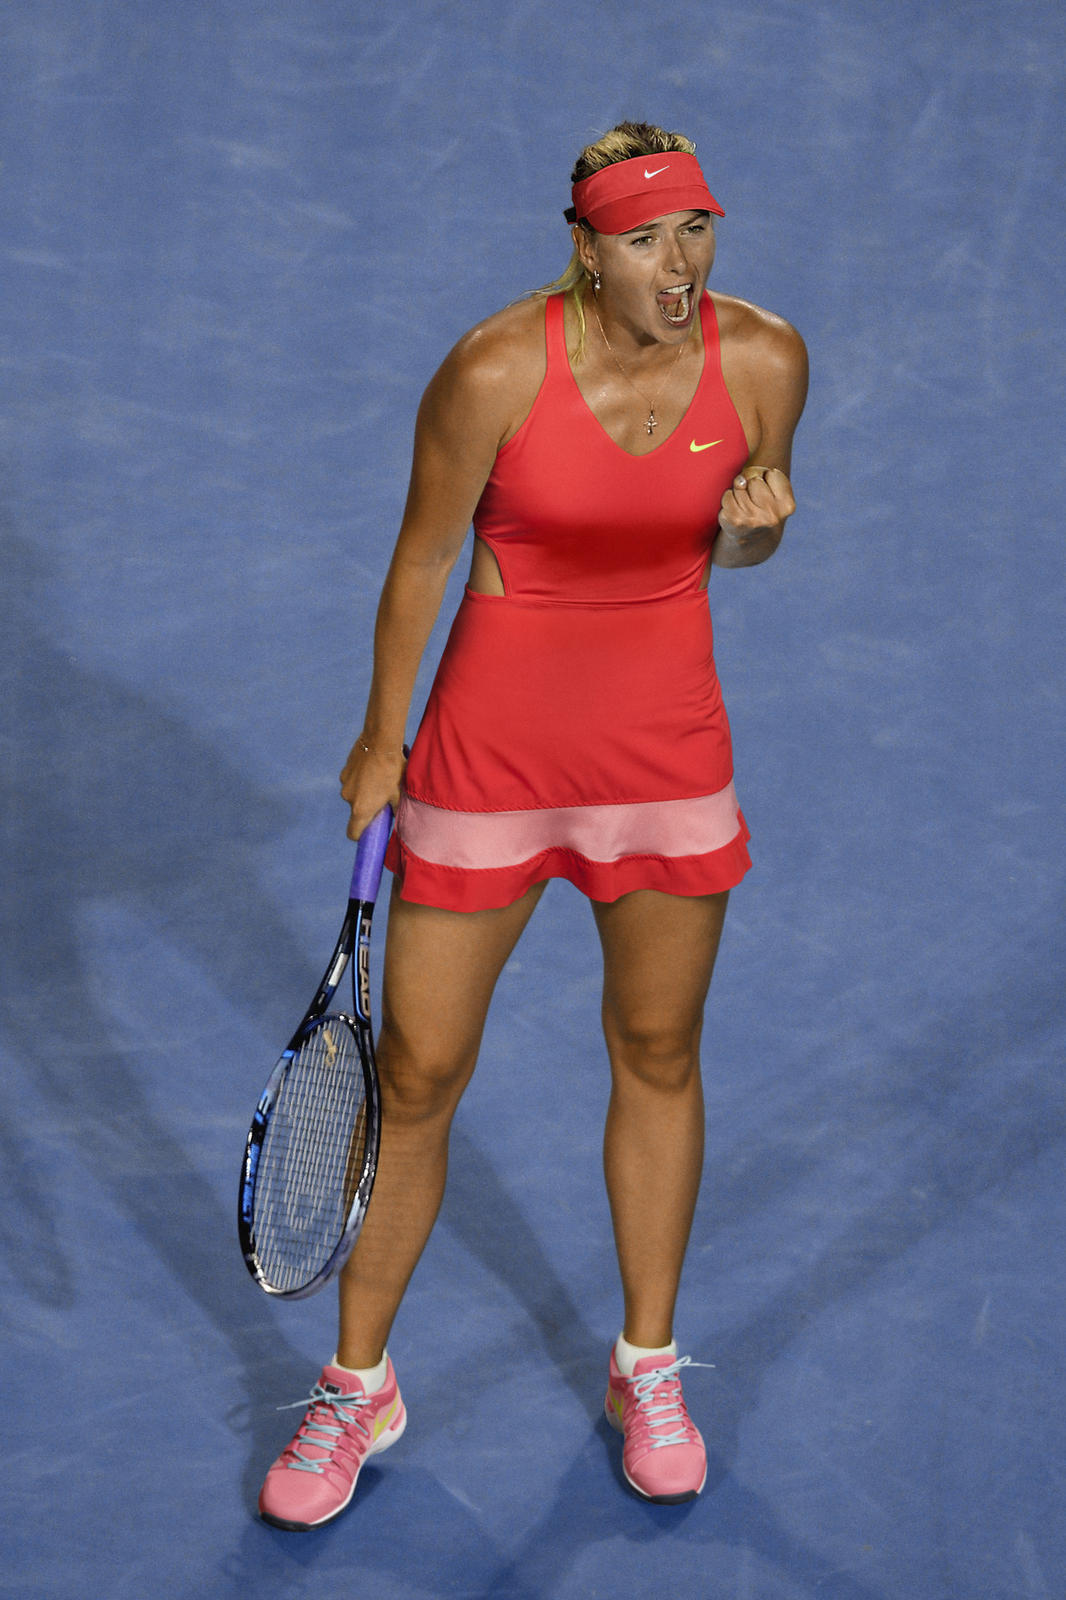 Open d'Australie 2015 - Tenue Maria Sharapova (Nike tennis outfit)